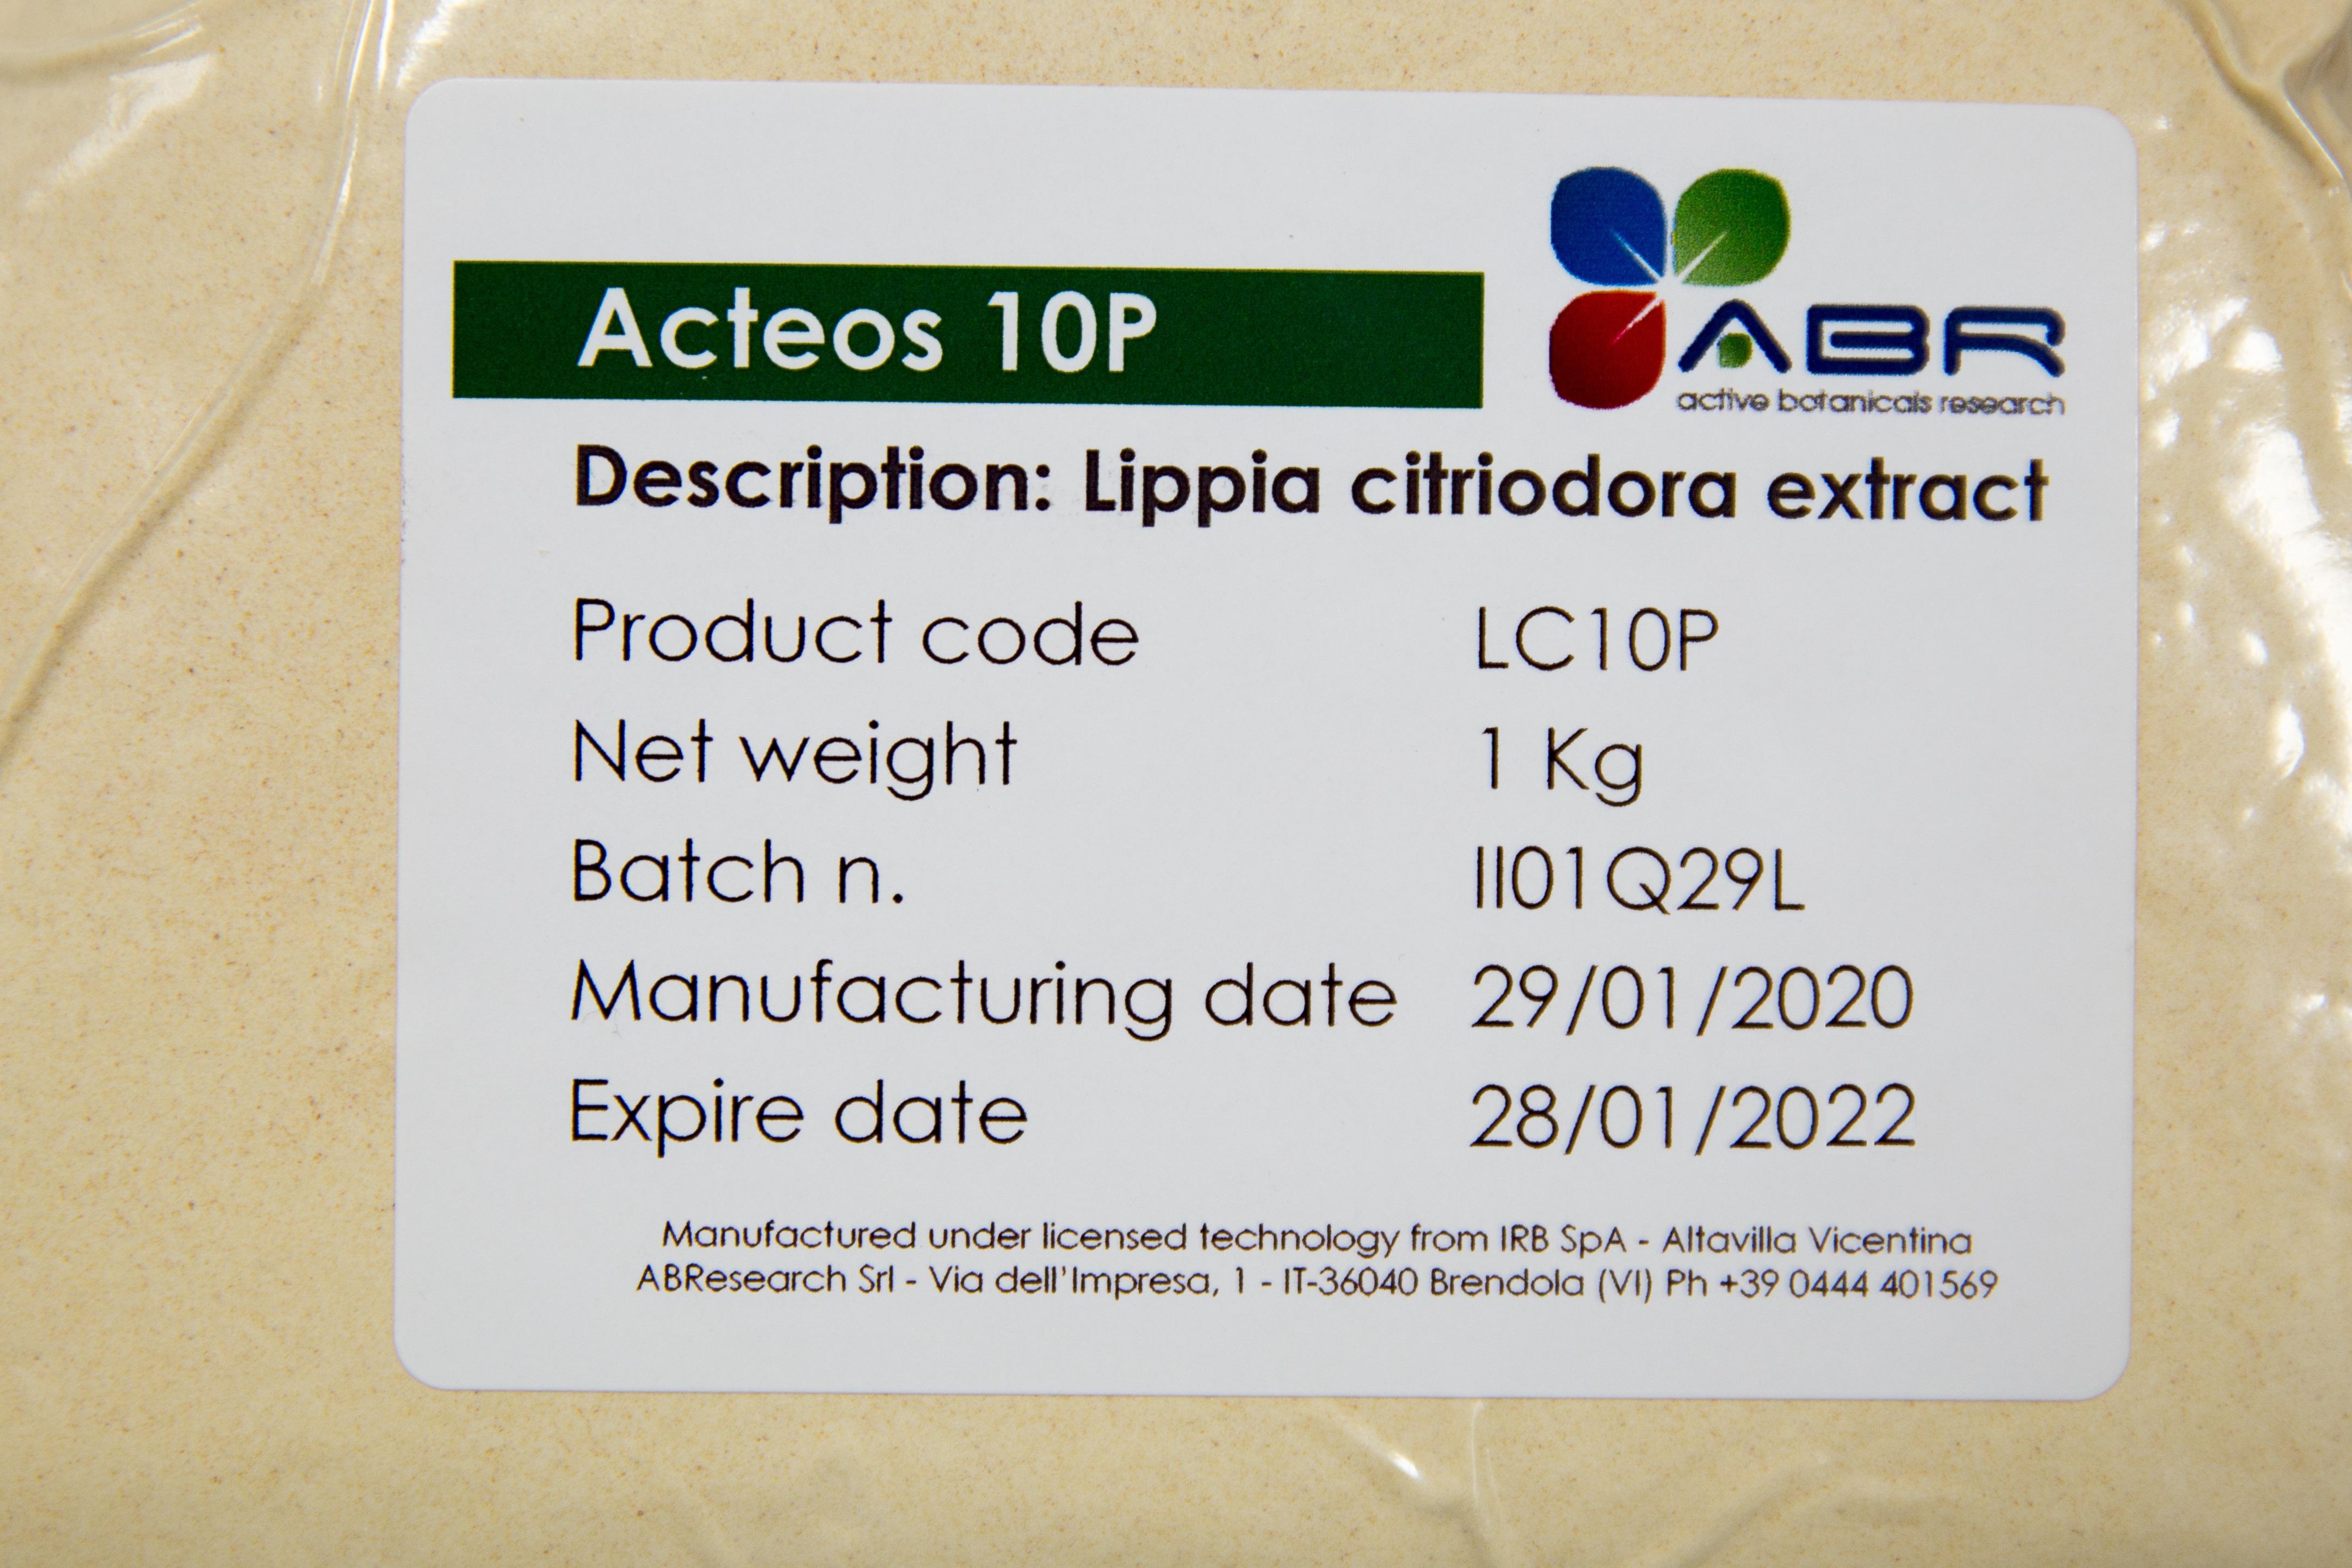 ACTEOS 10P - Lippia citriodora cell culture extract